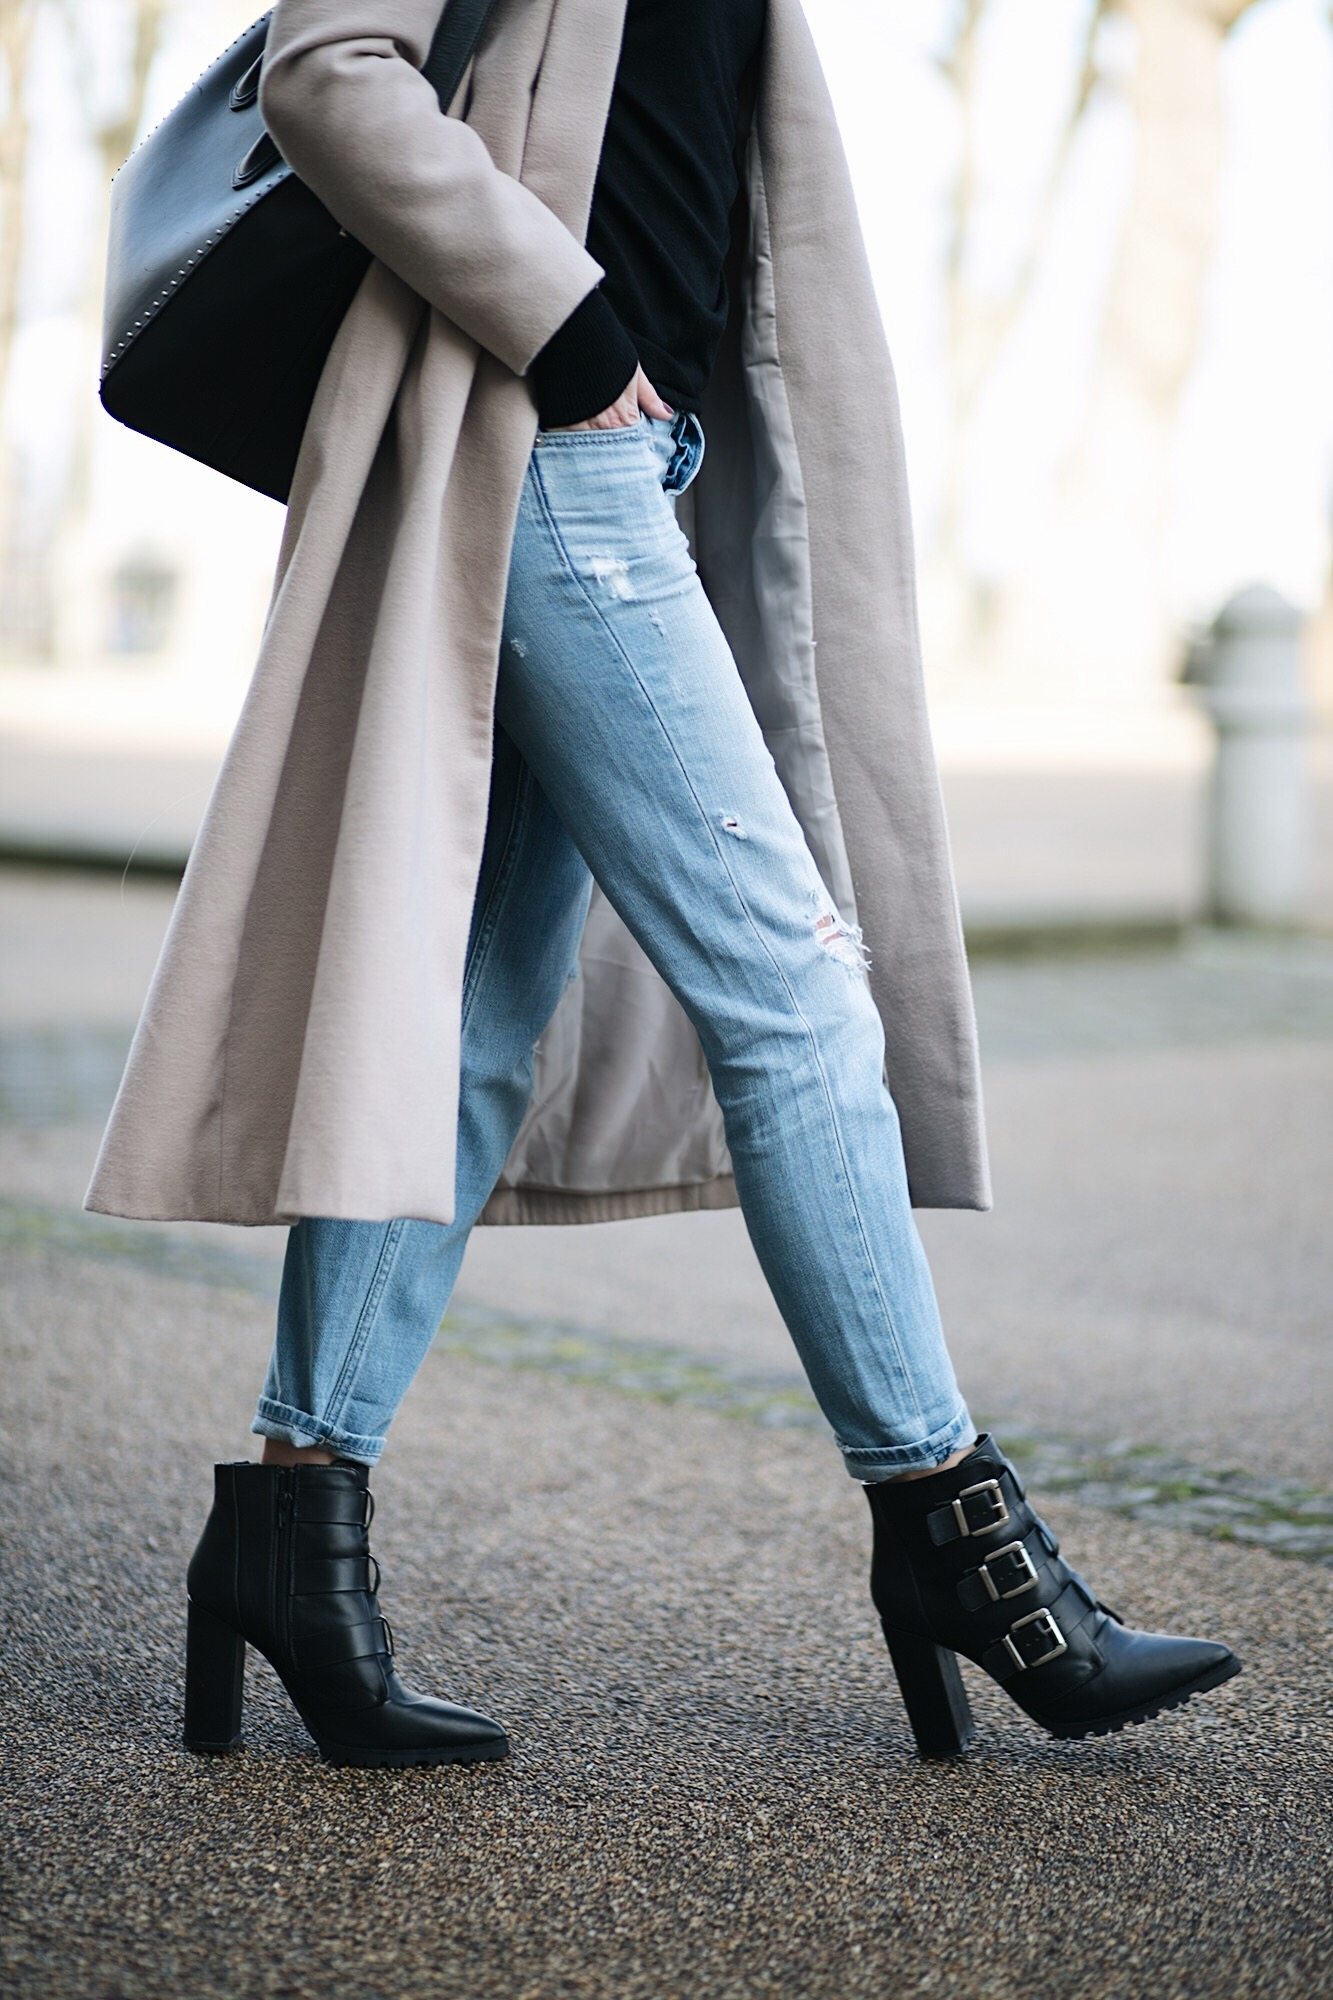 bleach wash boyfriend jeans, black buckle block heel ankle boots, beige coat, Givenchy Antigona